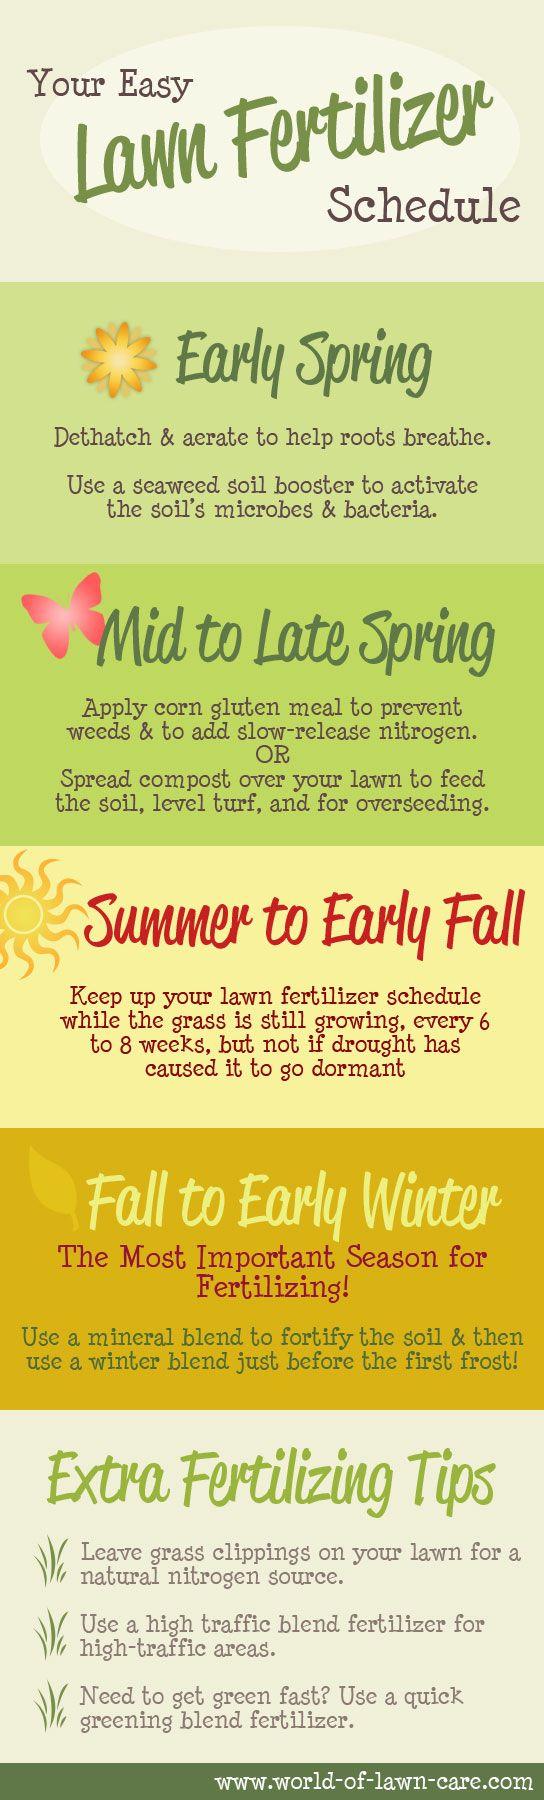 Lawn care advertising ideas - Lawn Fertilizer Schedule